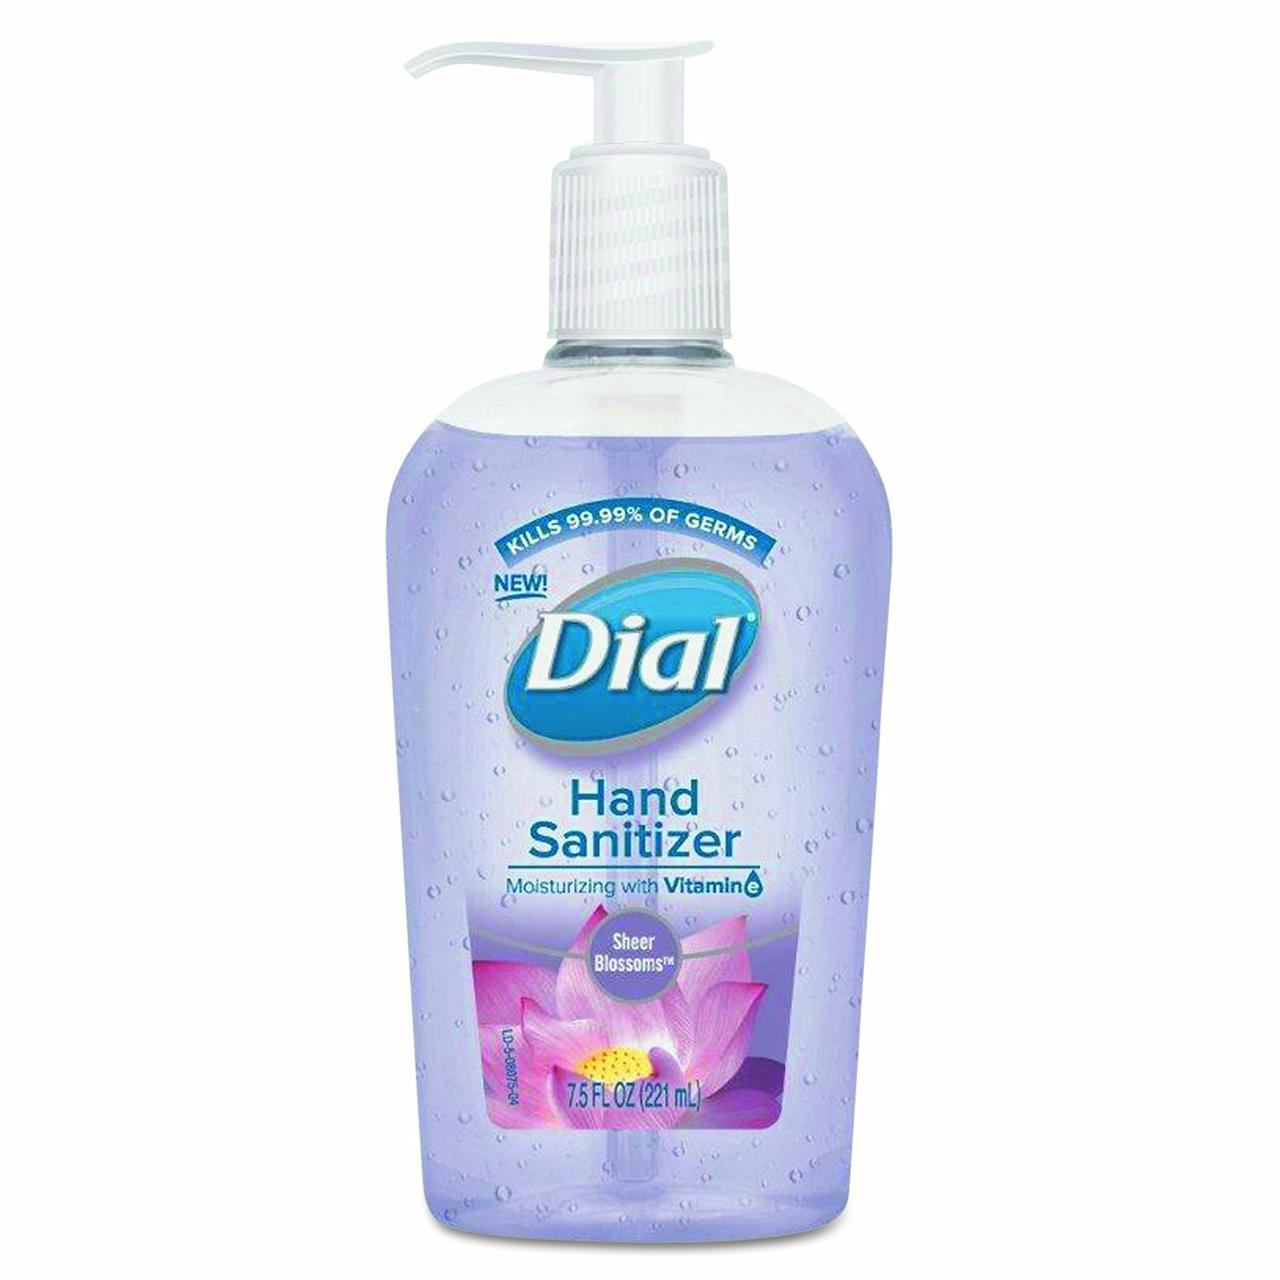 Dial Sheer Blossoms Hand Sanitizer, 7.5 fl oz by Henkel AG & Co